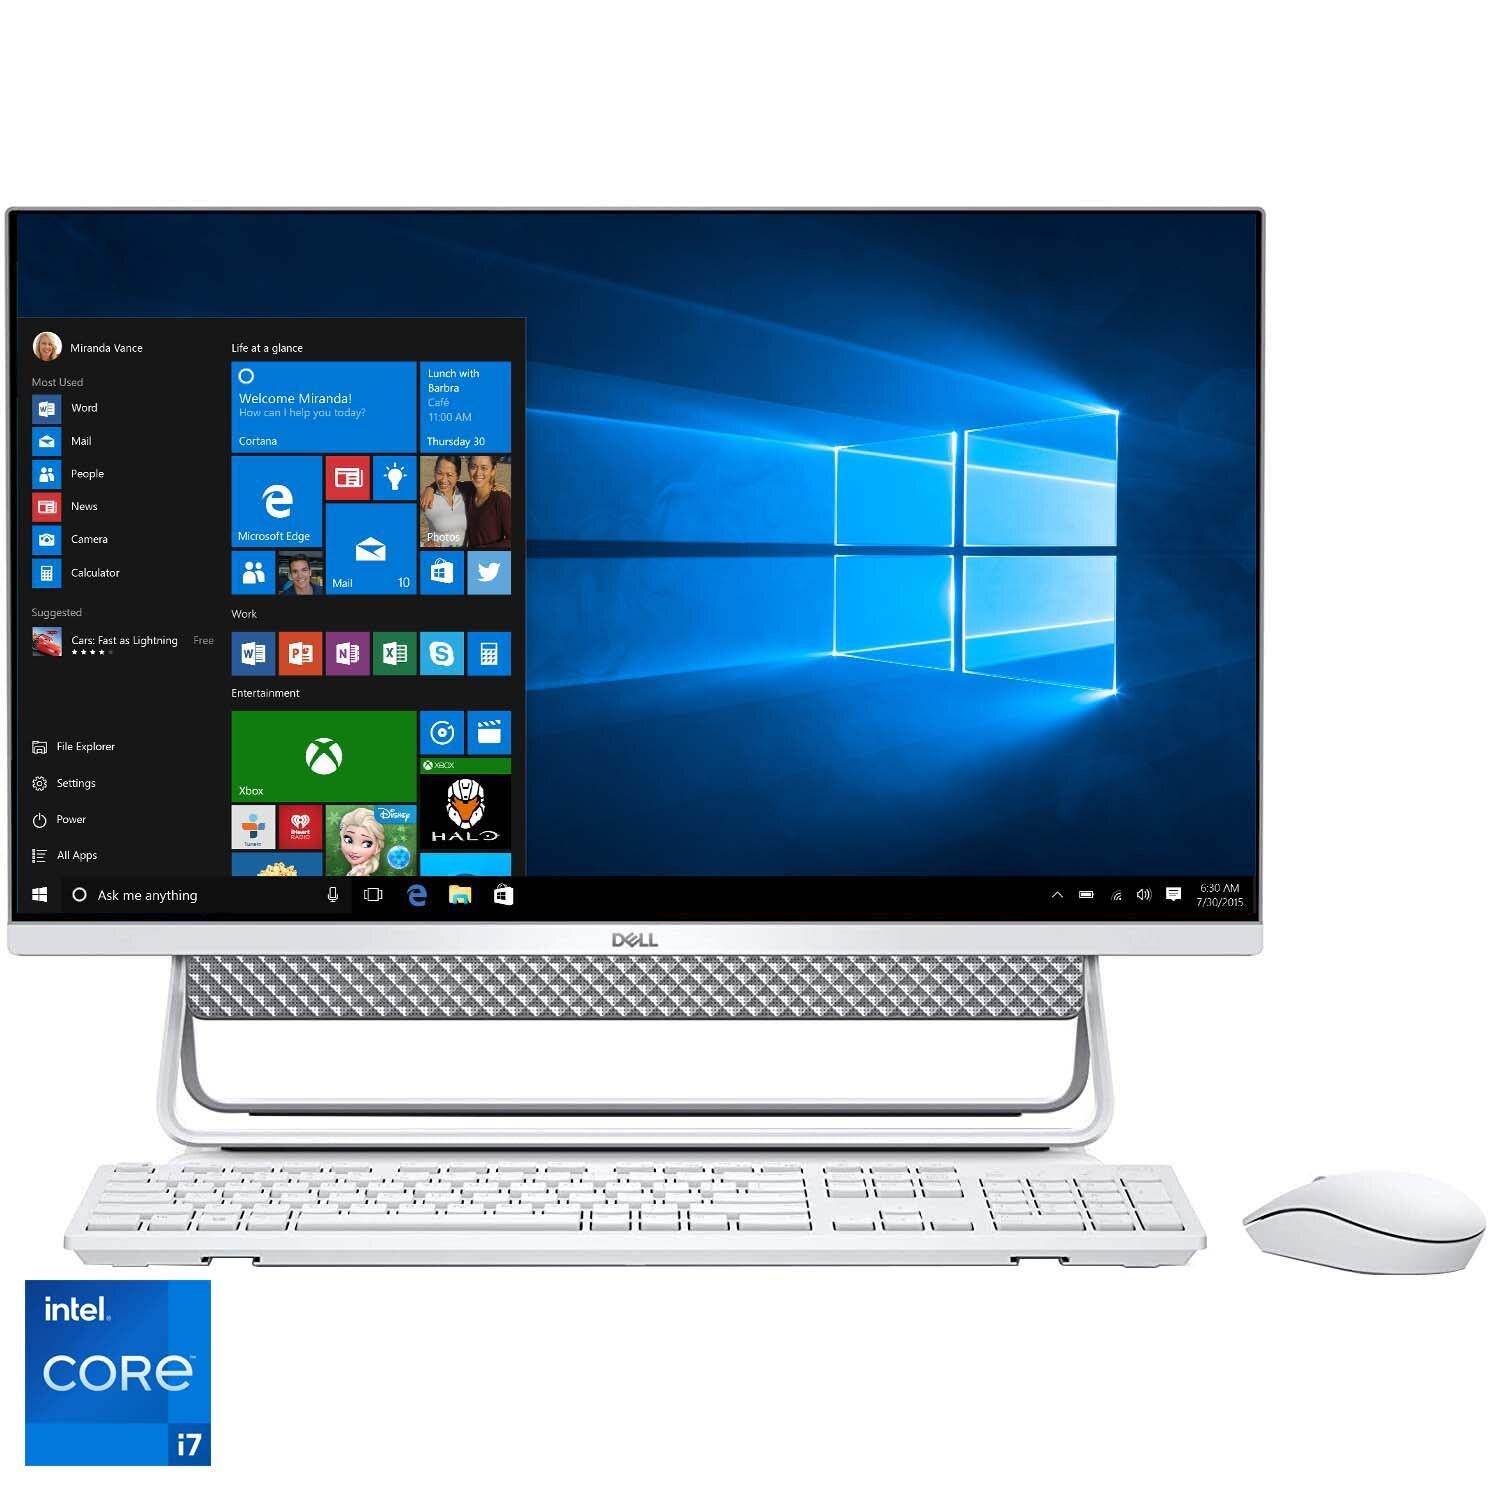 "Fotografie Sistem All-In-One Dell Inspiron 7700 cu procesor Intel® Core™ i7-1165G7 pana la 4.70 GHz, Tiger Lake, 27"", Full HD, Touch, 16GB DDR4, 1TB HDD + 512GB SSD, NVIDIA GeForce MX330 2GB GDDR5, Windows 10 Pro"